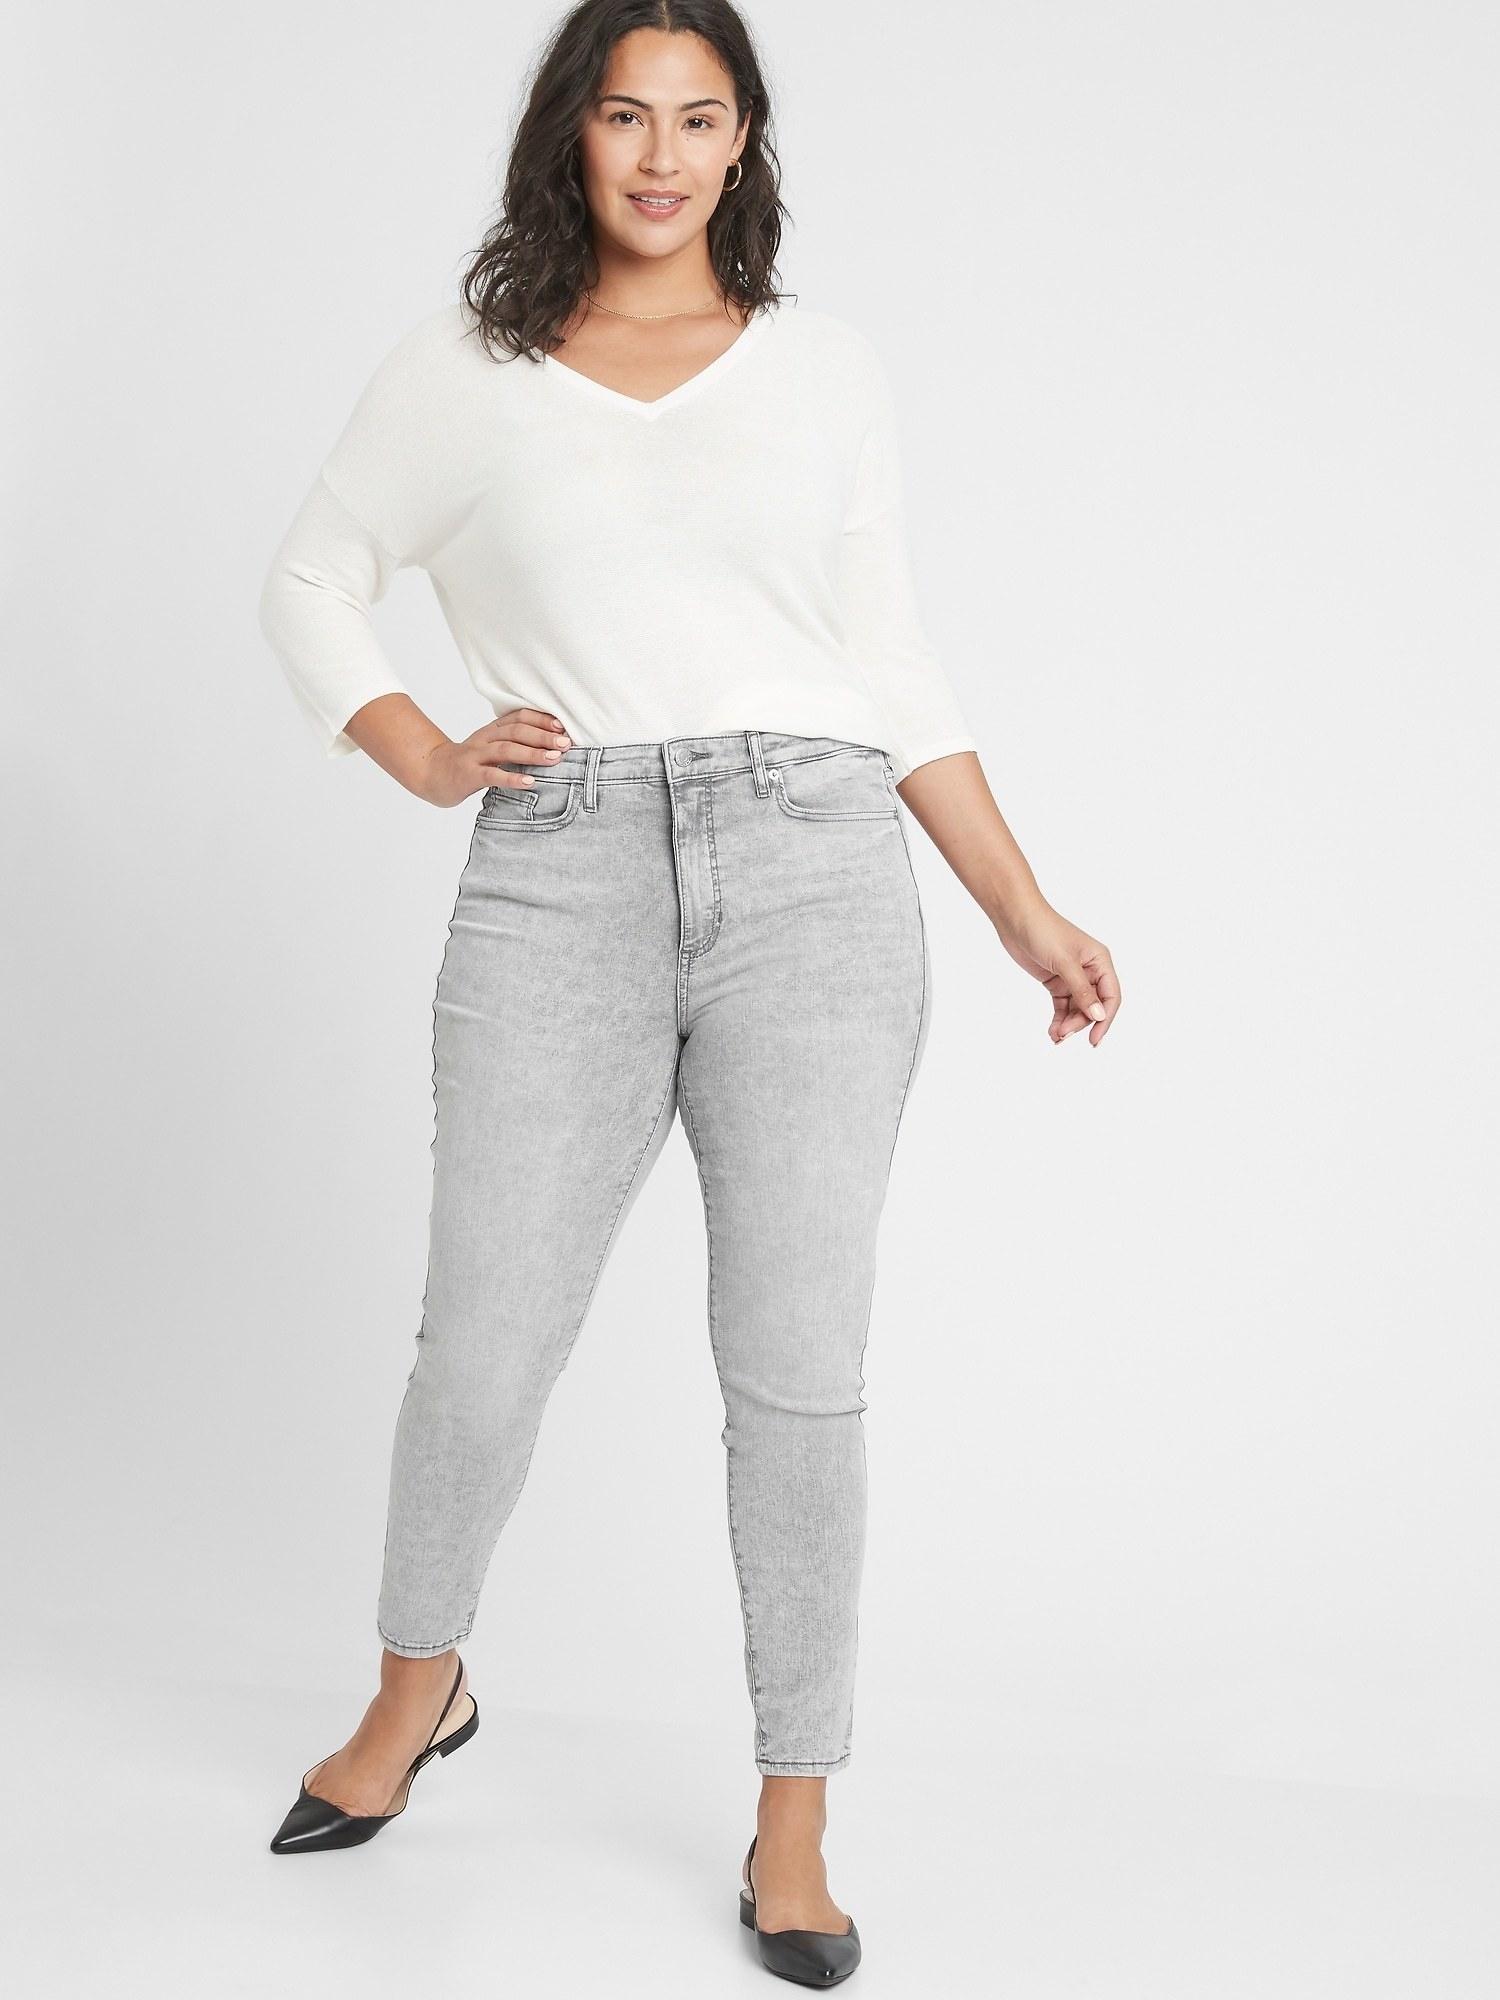 model wearing grey acid wash jeans in curvy fit